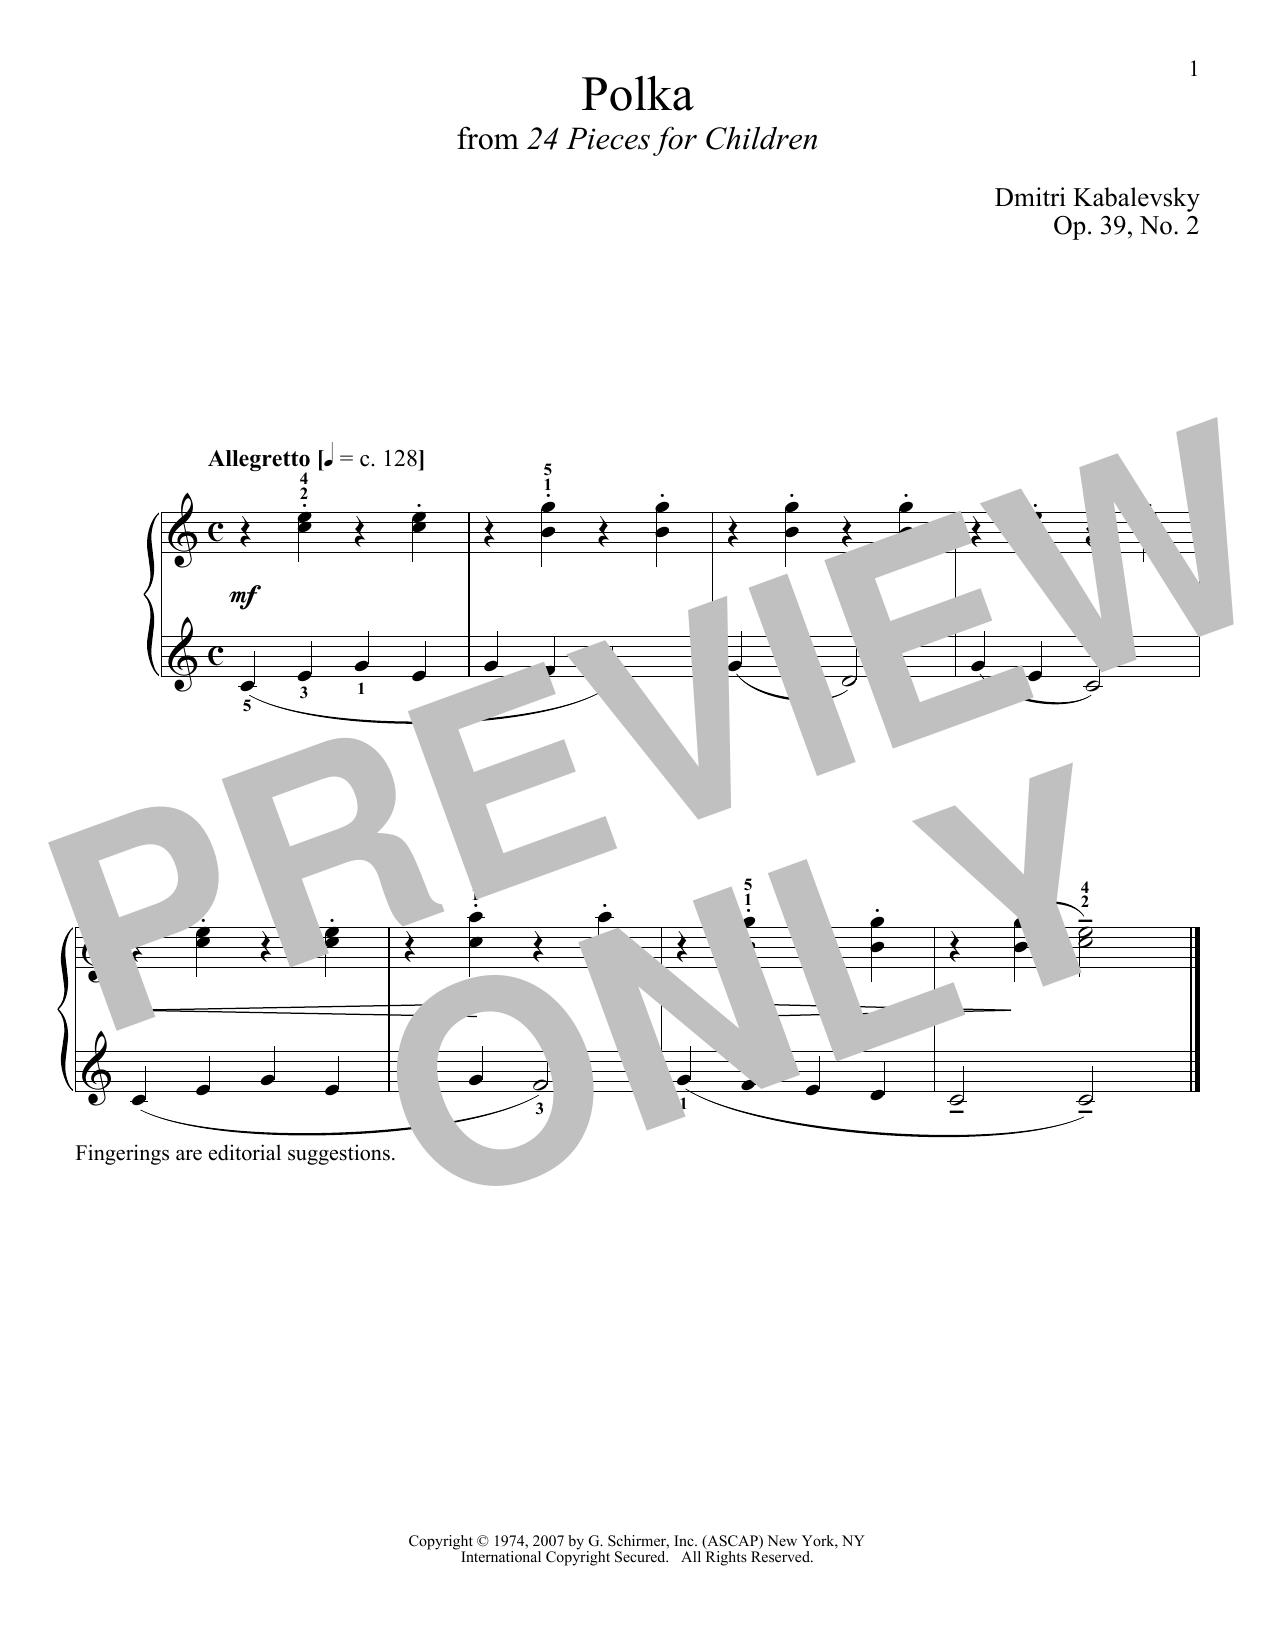 Dmitri Kabalevsky Polka, Op. 39, No. 2 sheet music notes and chords